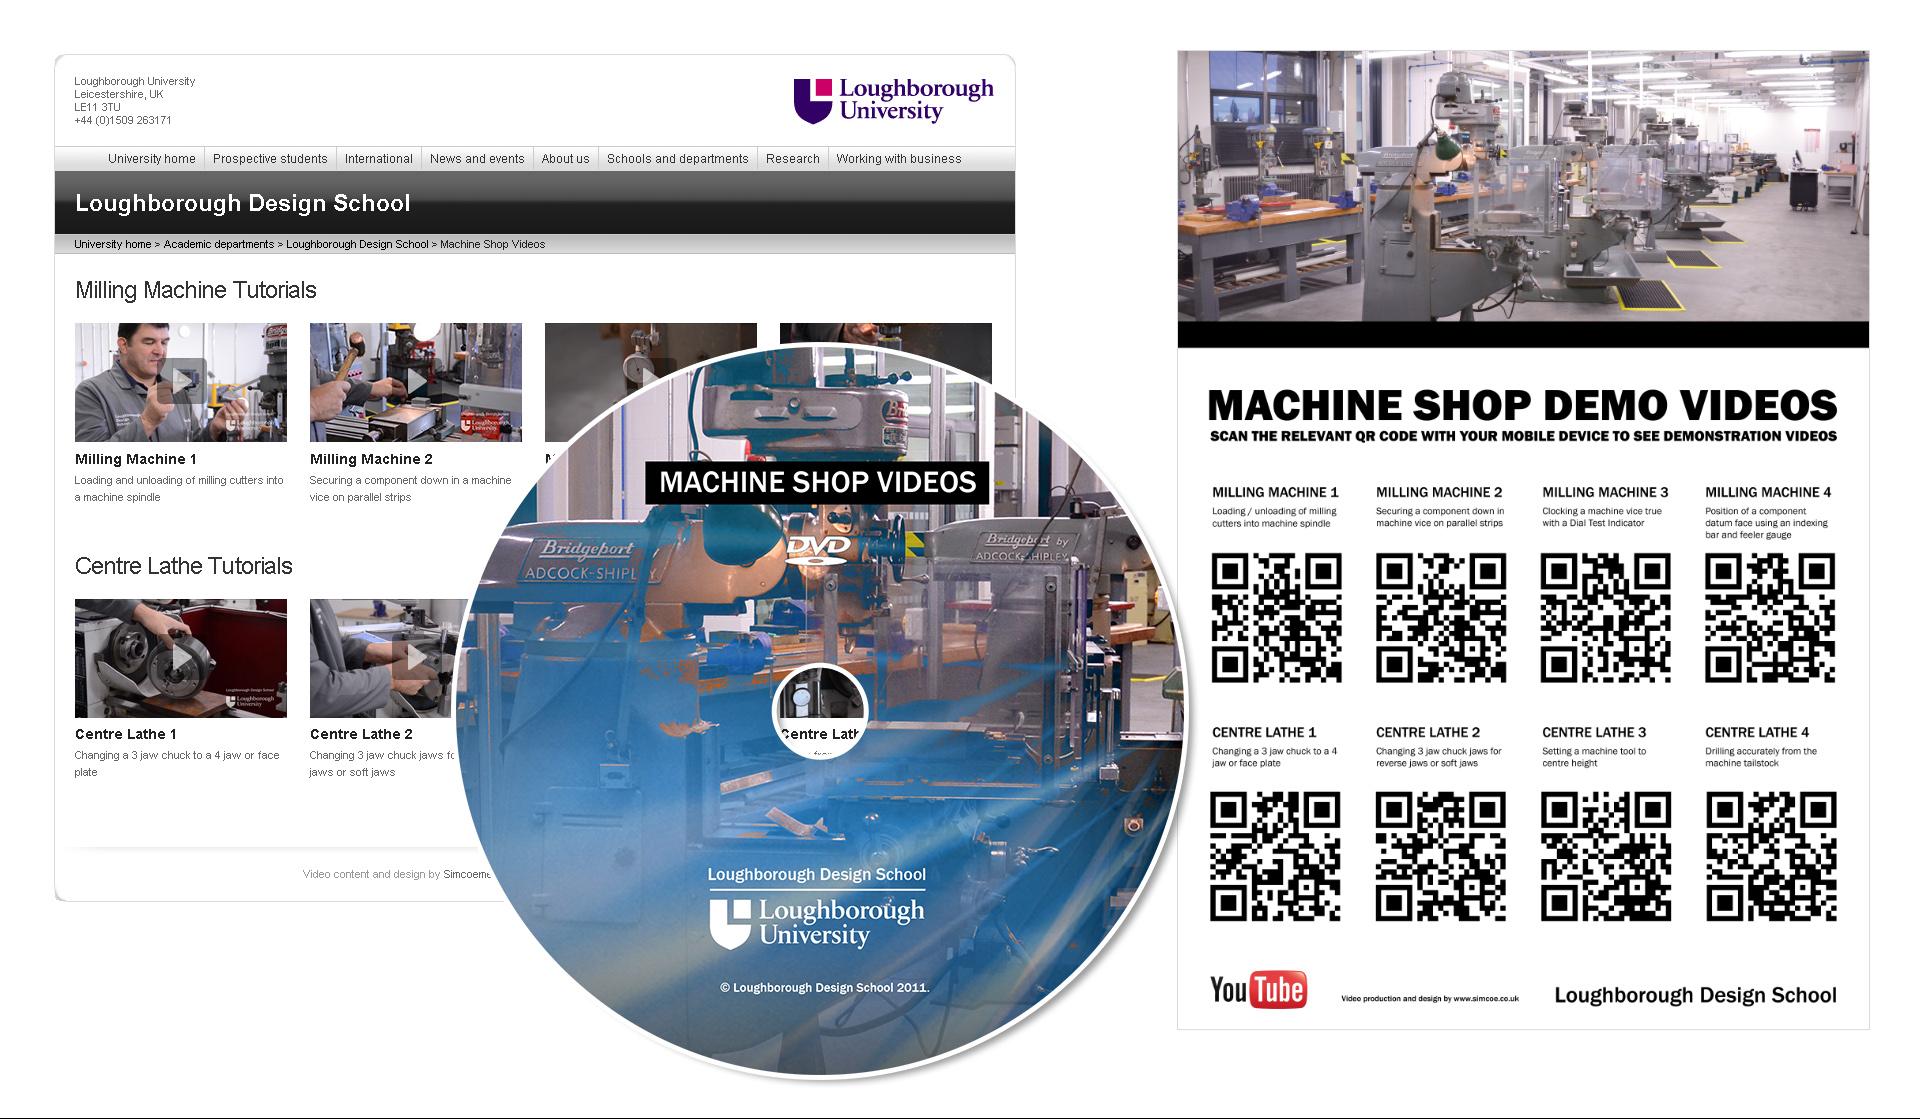 Loughborough Design School machine shop video and print material